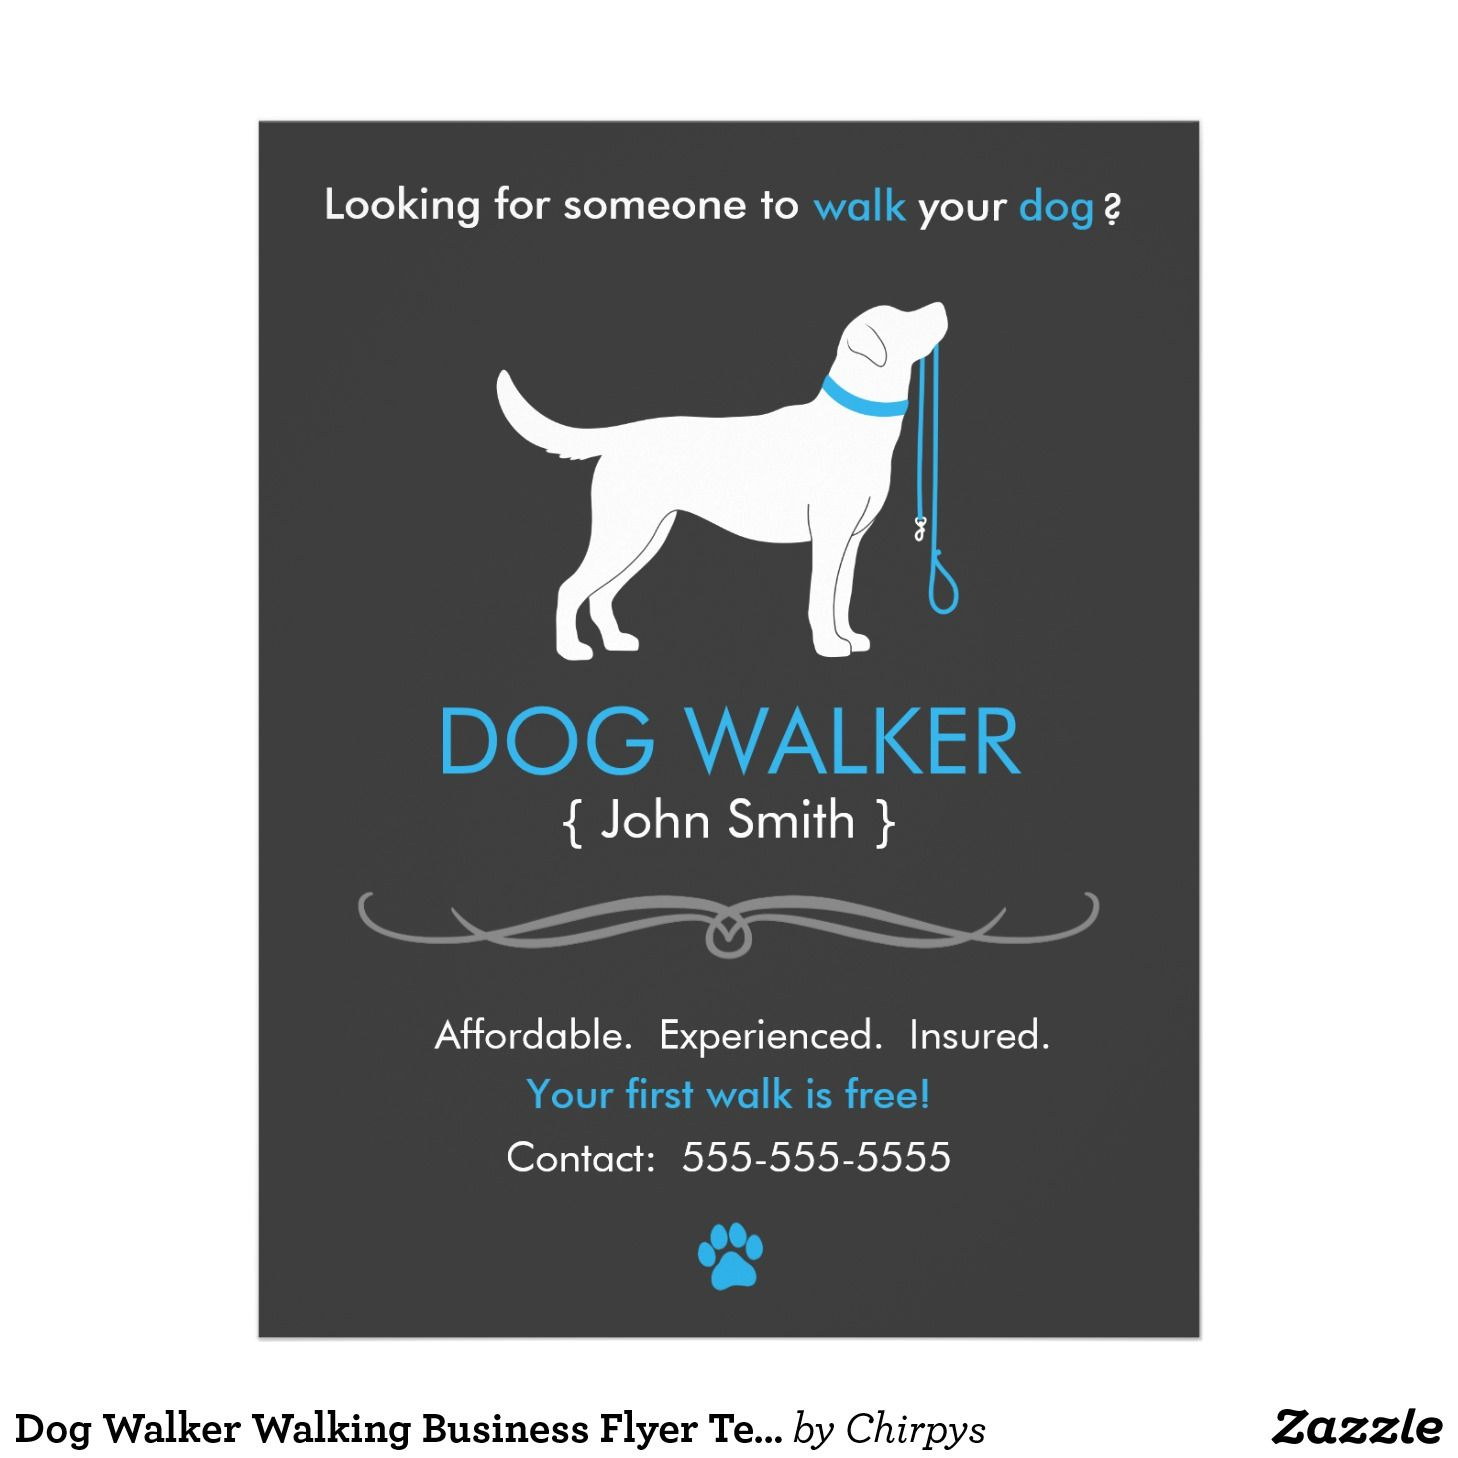 Dog Walker Walking Business Flyer Template Zazzle Com Dog